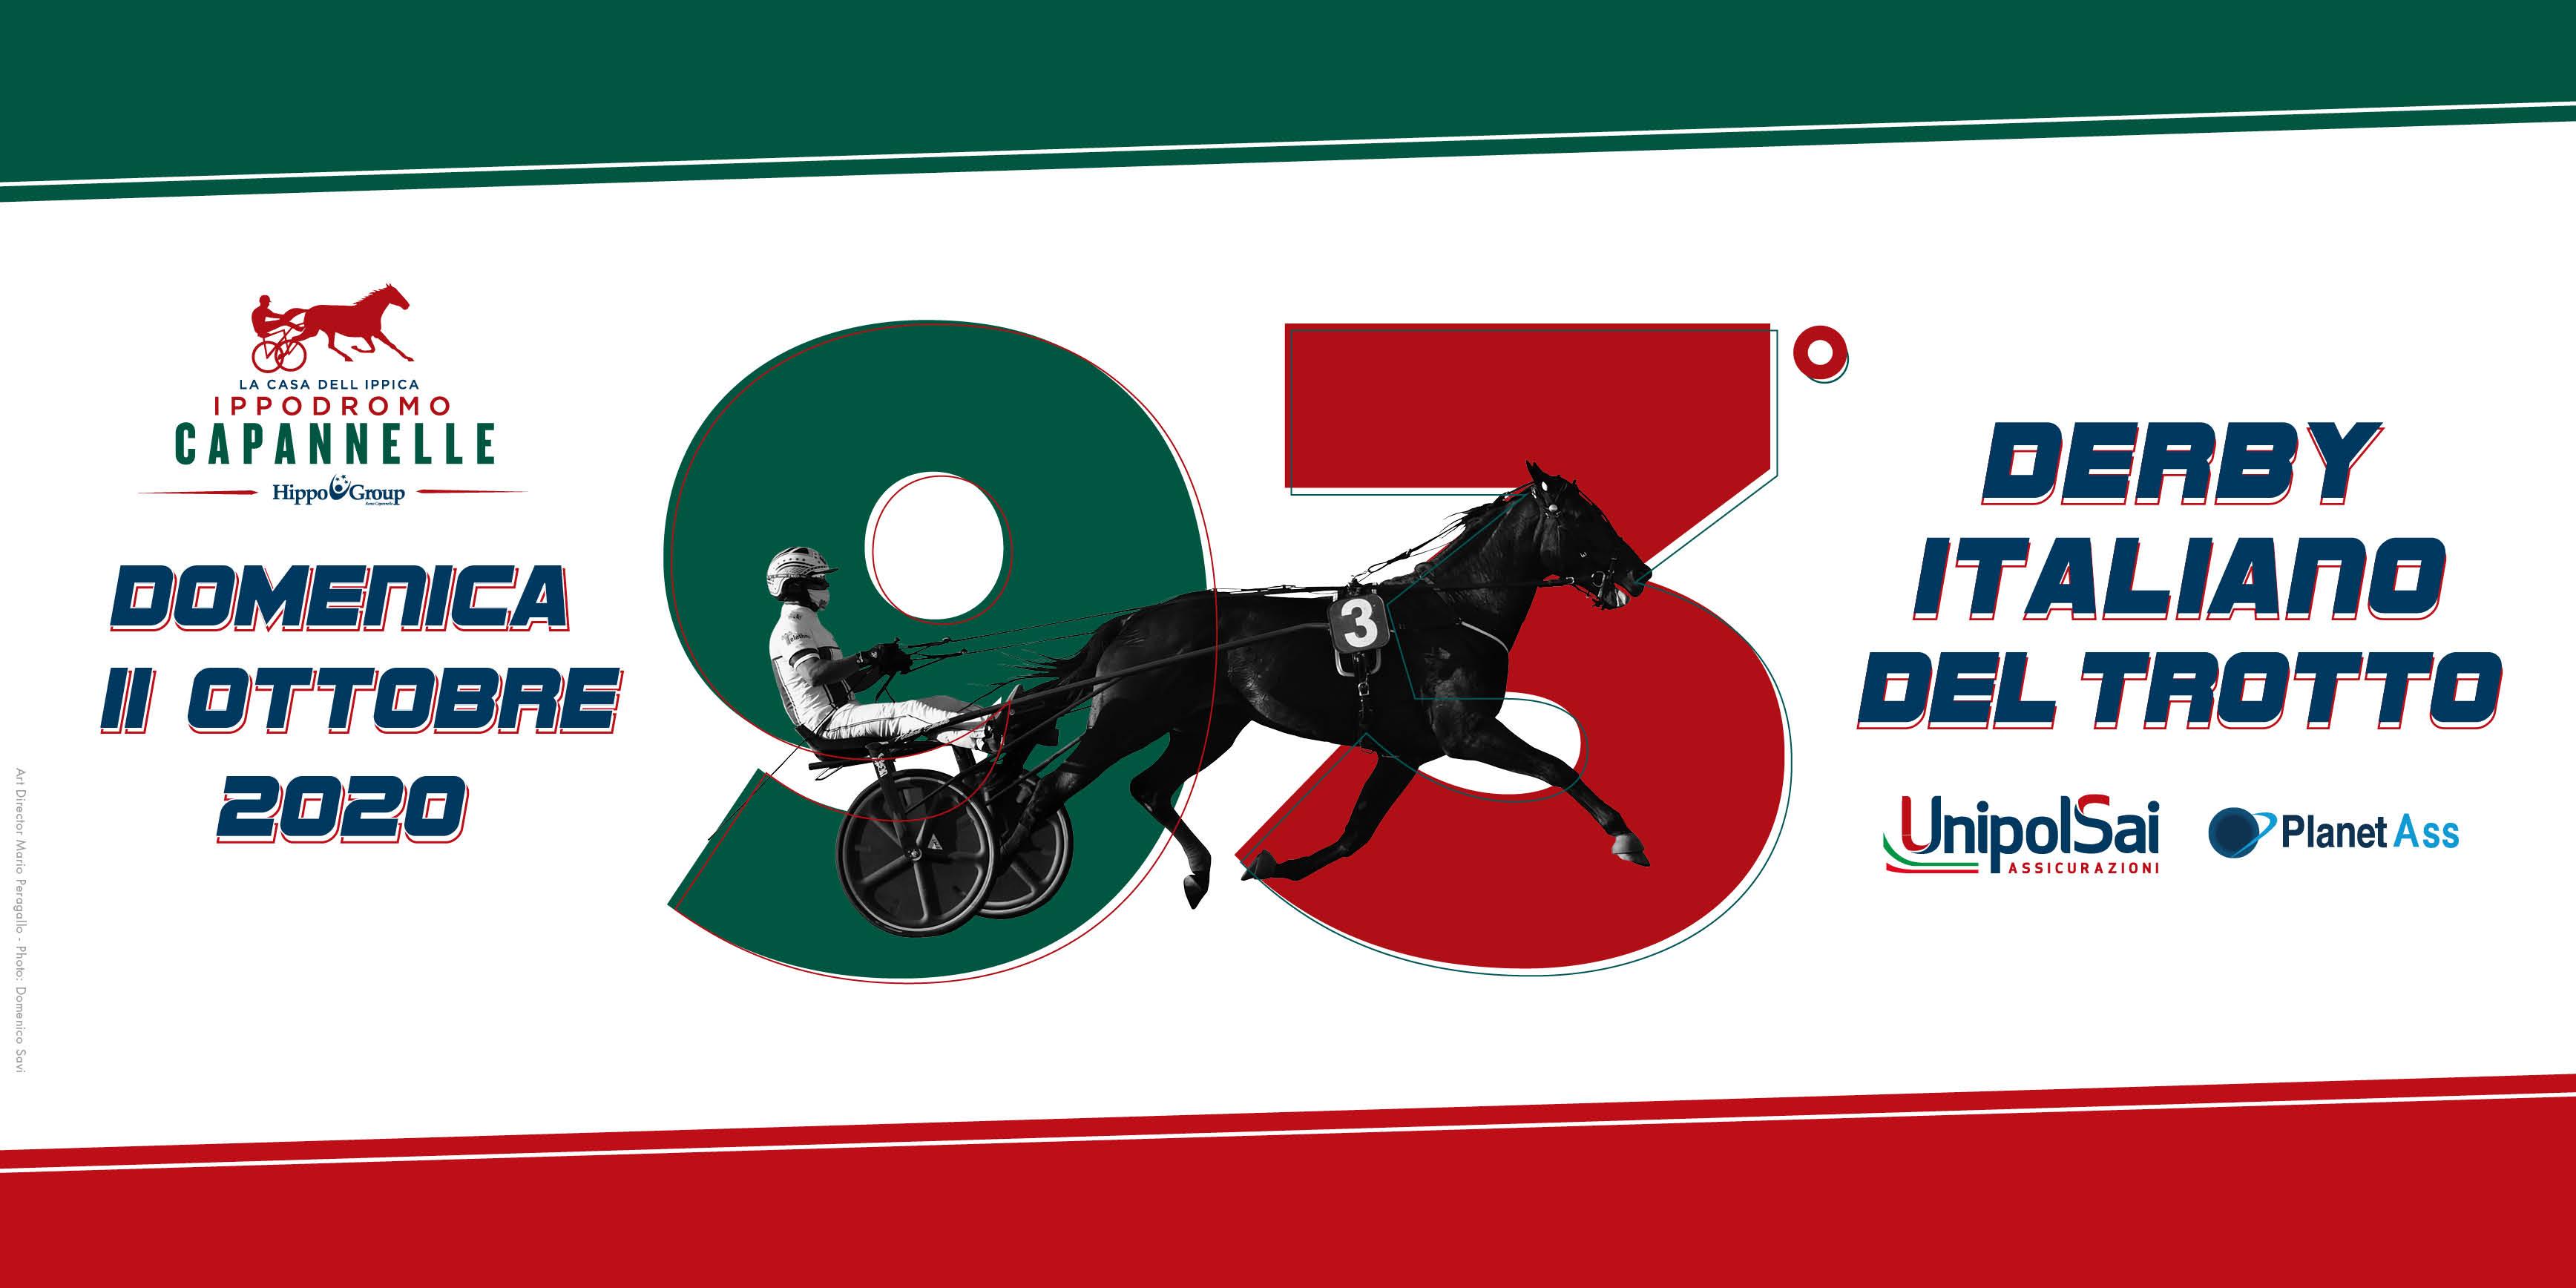 DERBY ITALIANO11 OttobreRoma,Ippodromo Capannelle